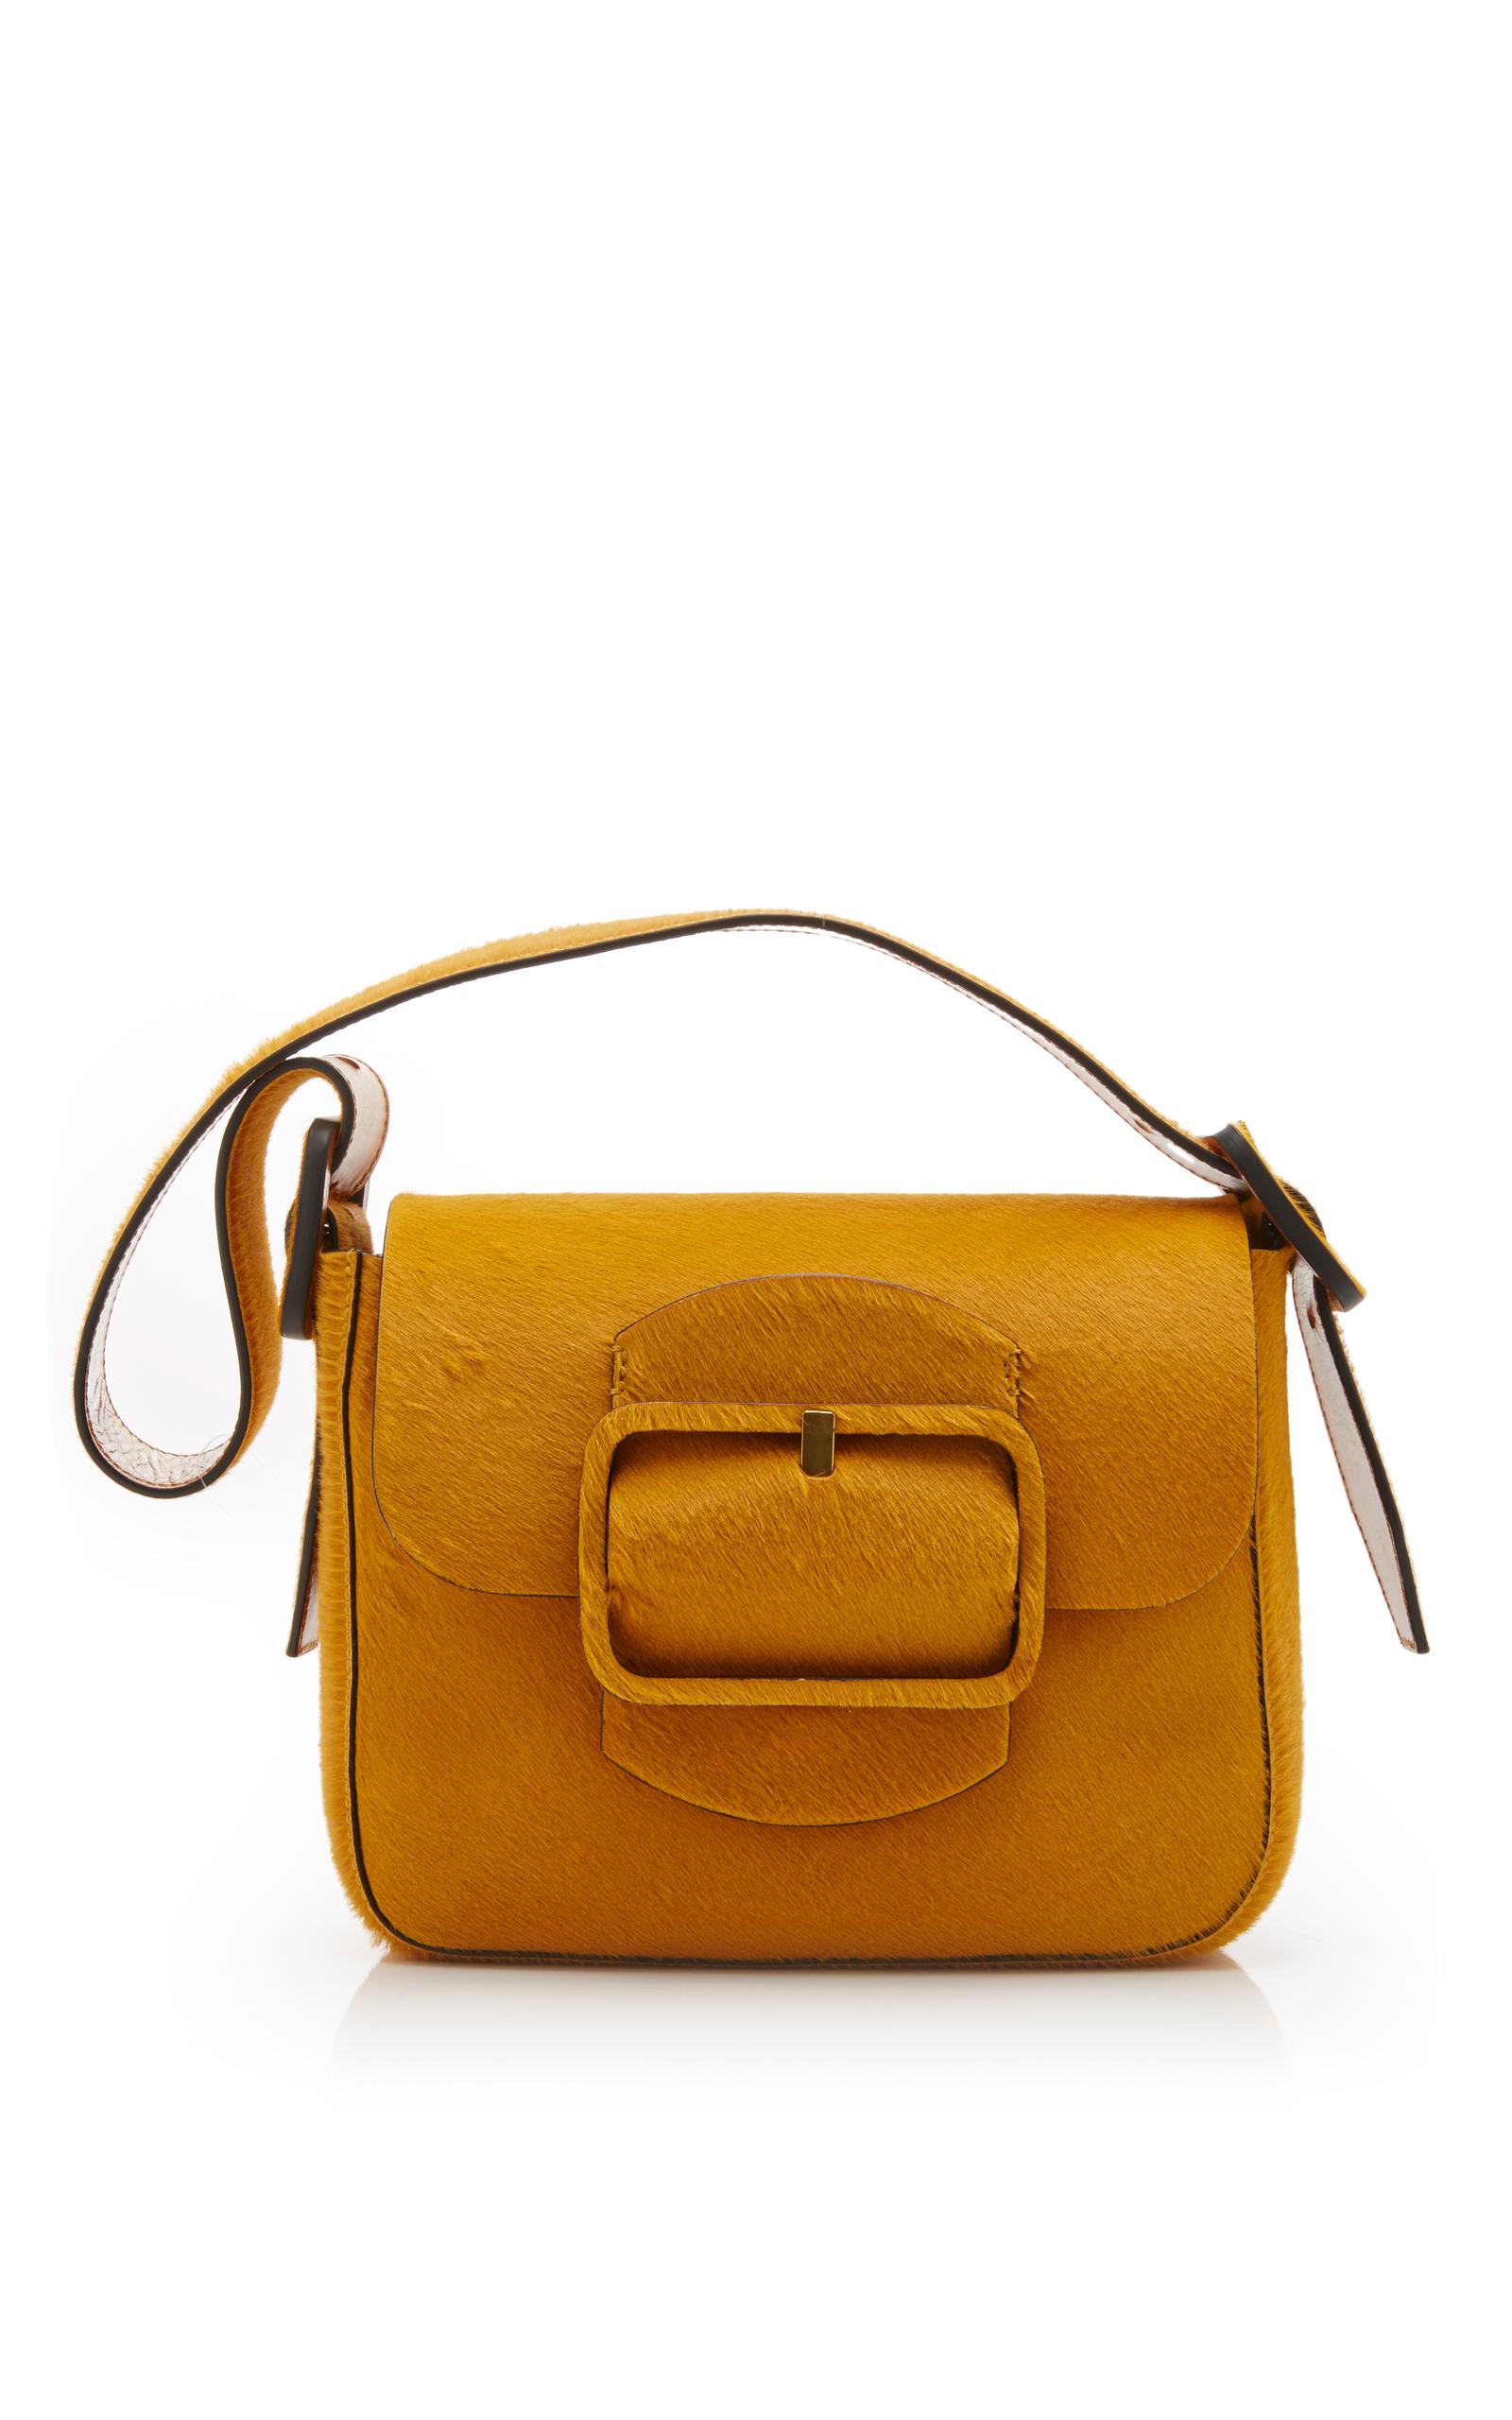 a4eb7fafa8b Tory BurchSawyer Calf-Hair Small Shoulder Bag. CLOSE. Loading